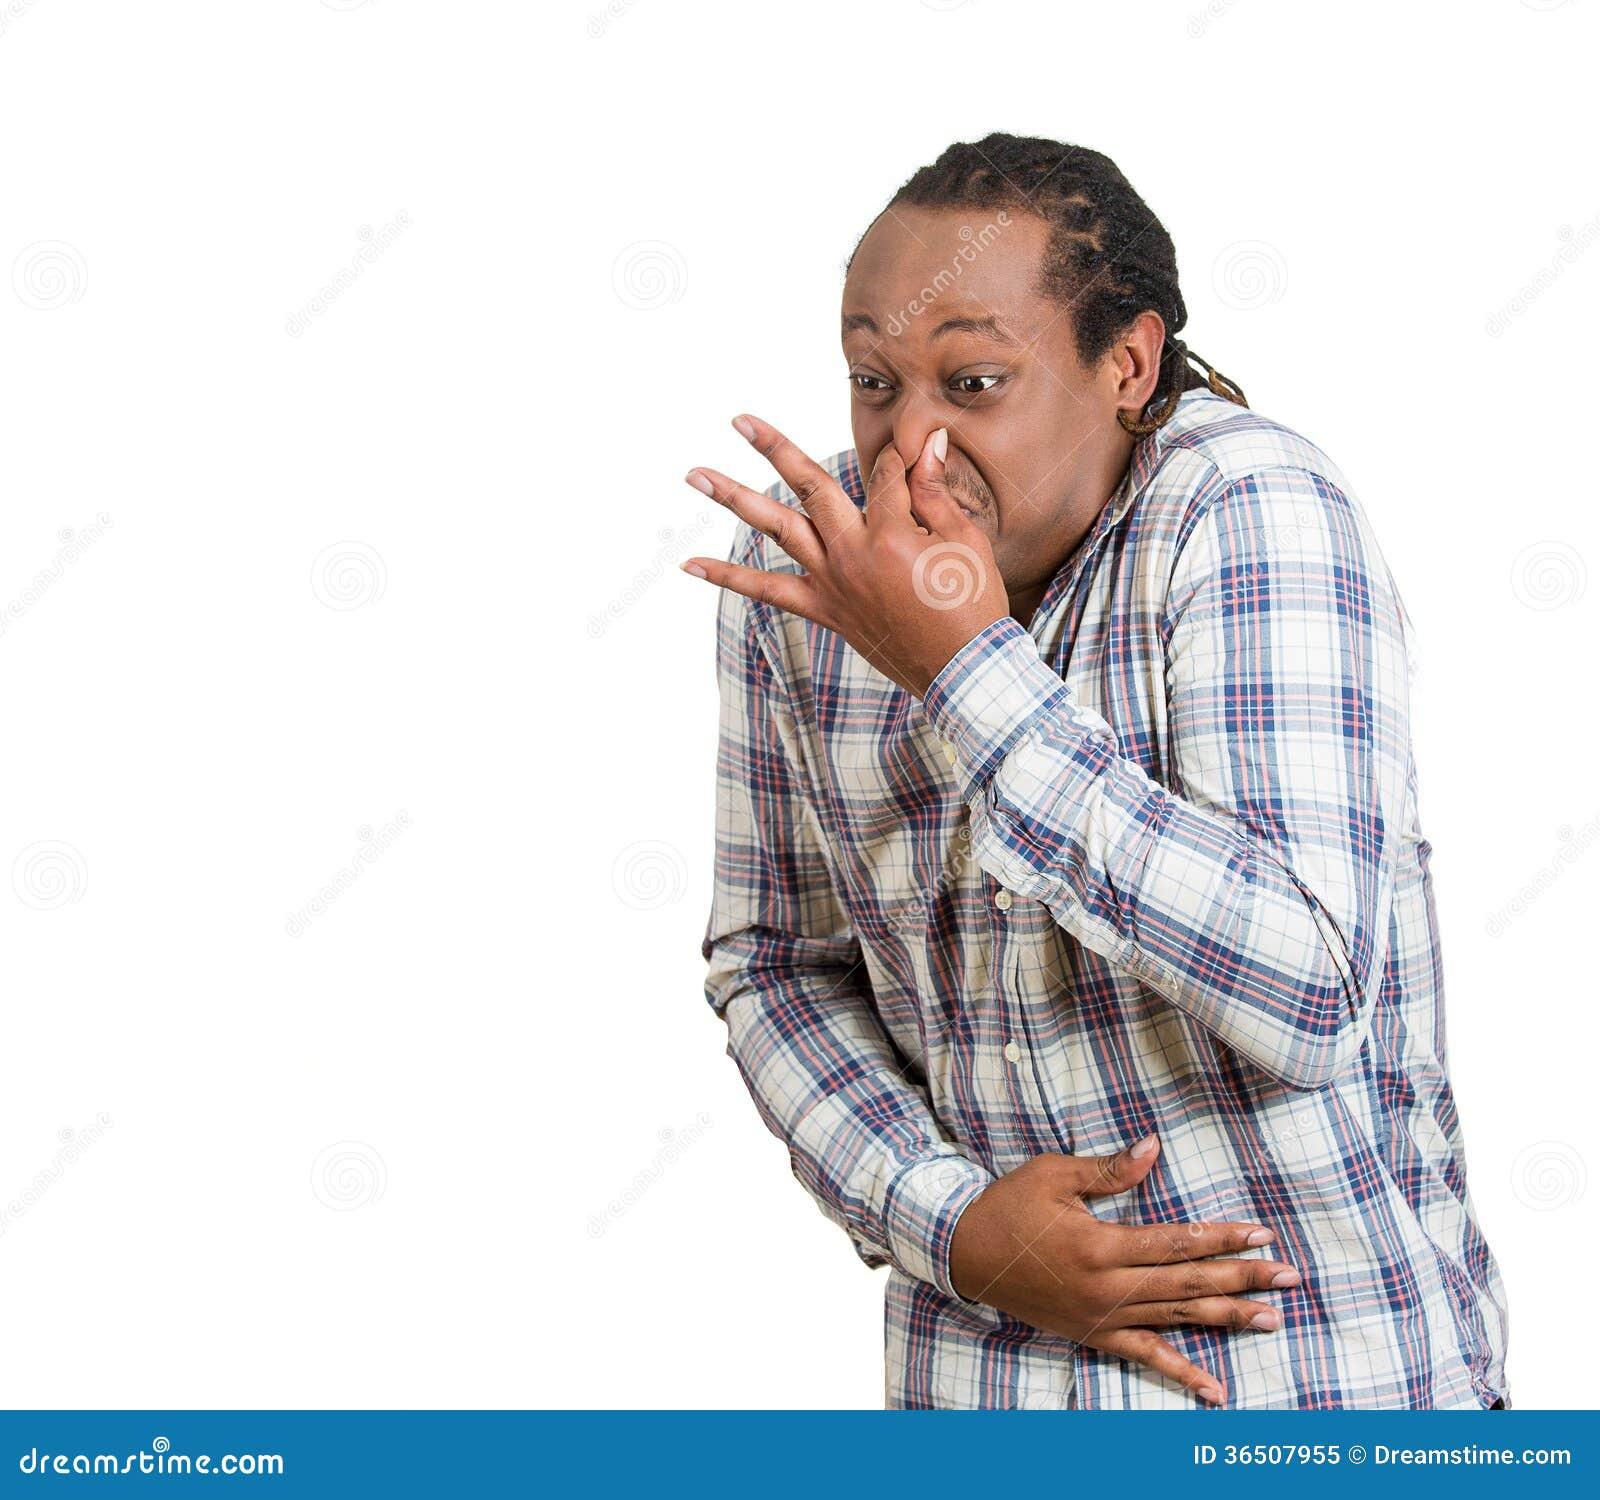 Young man smells her panties then fucks her